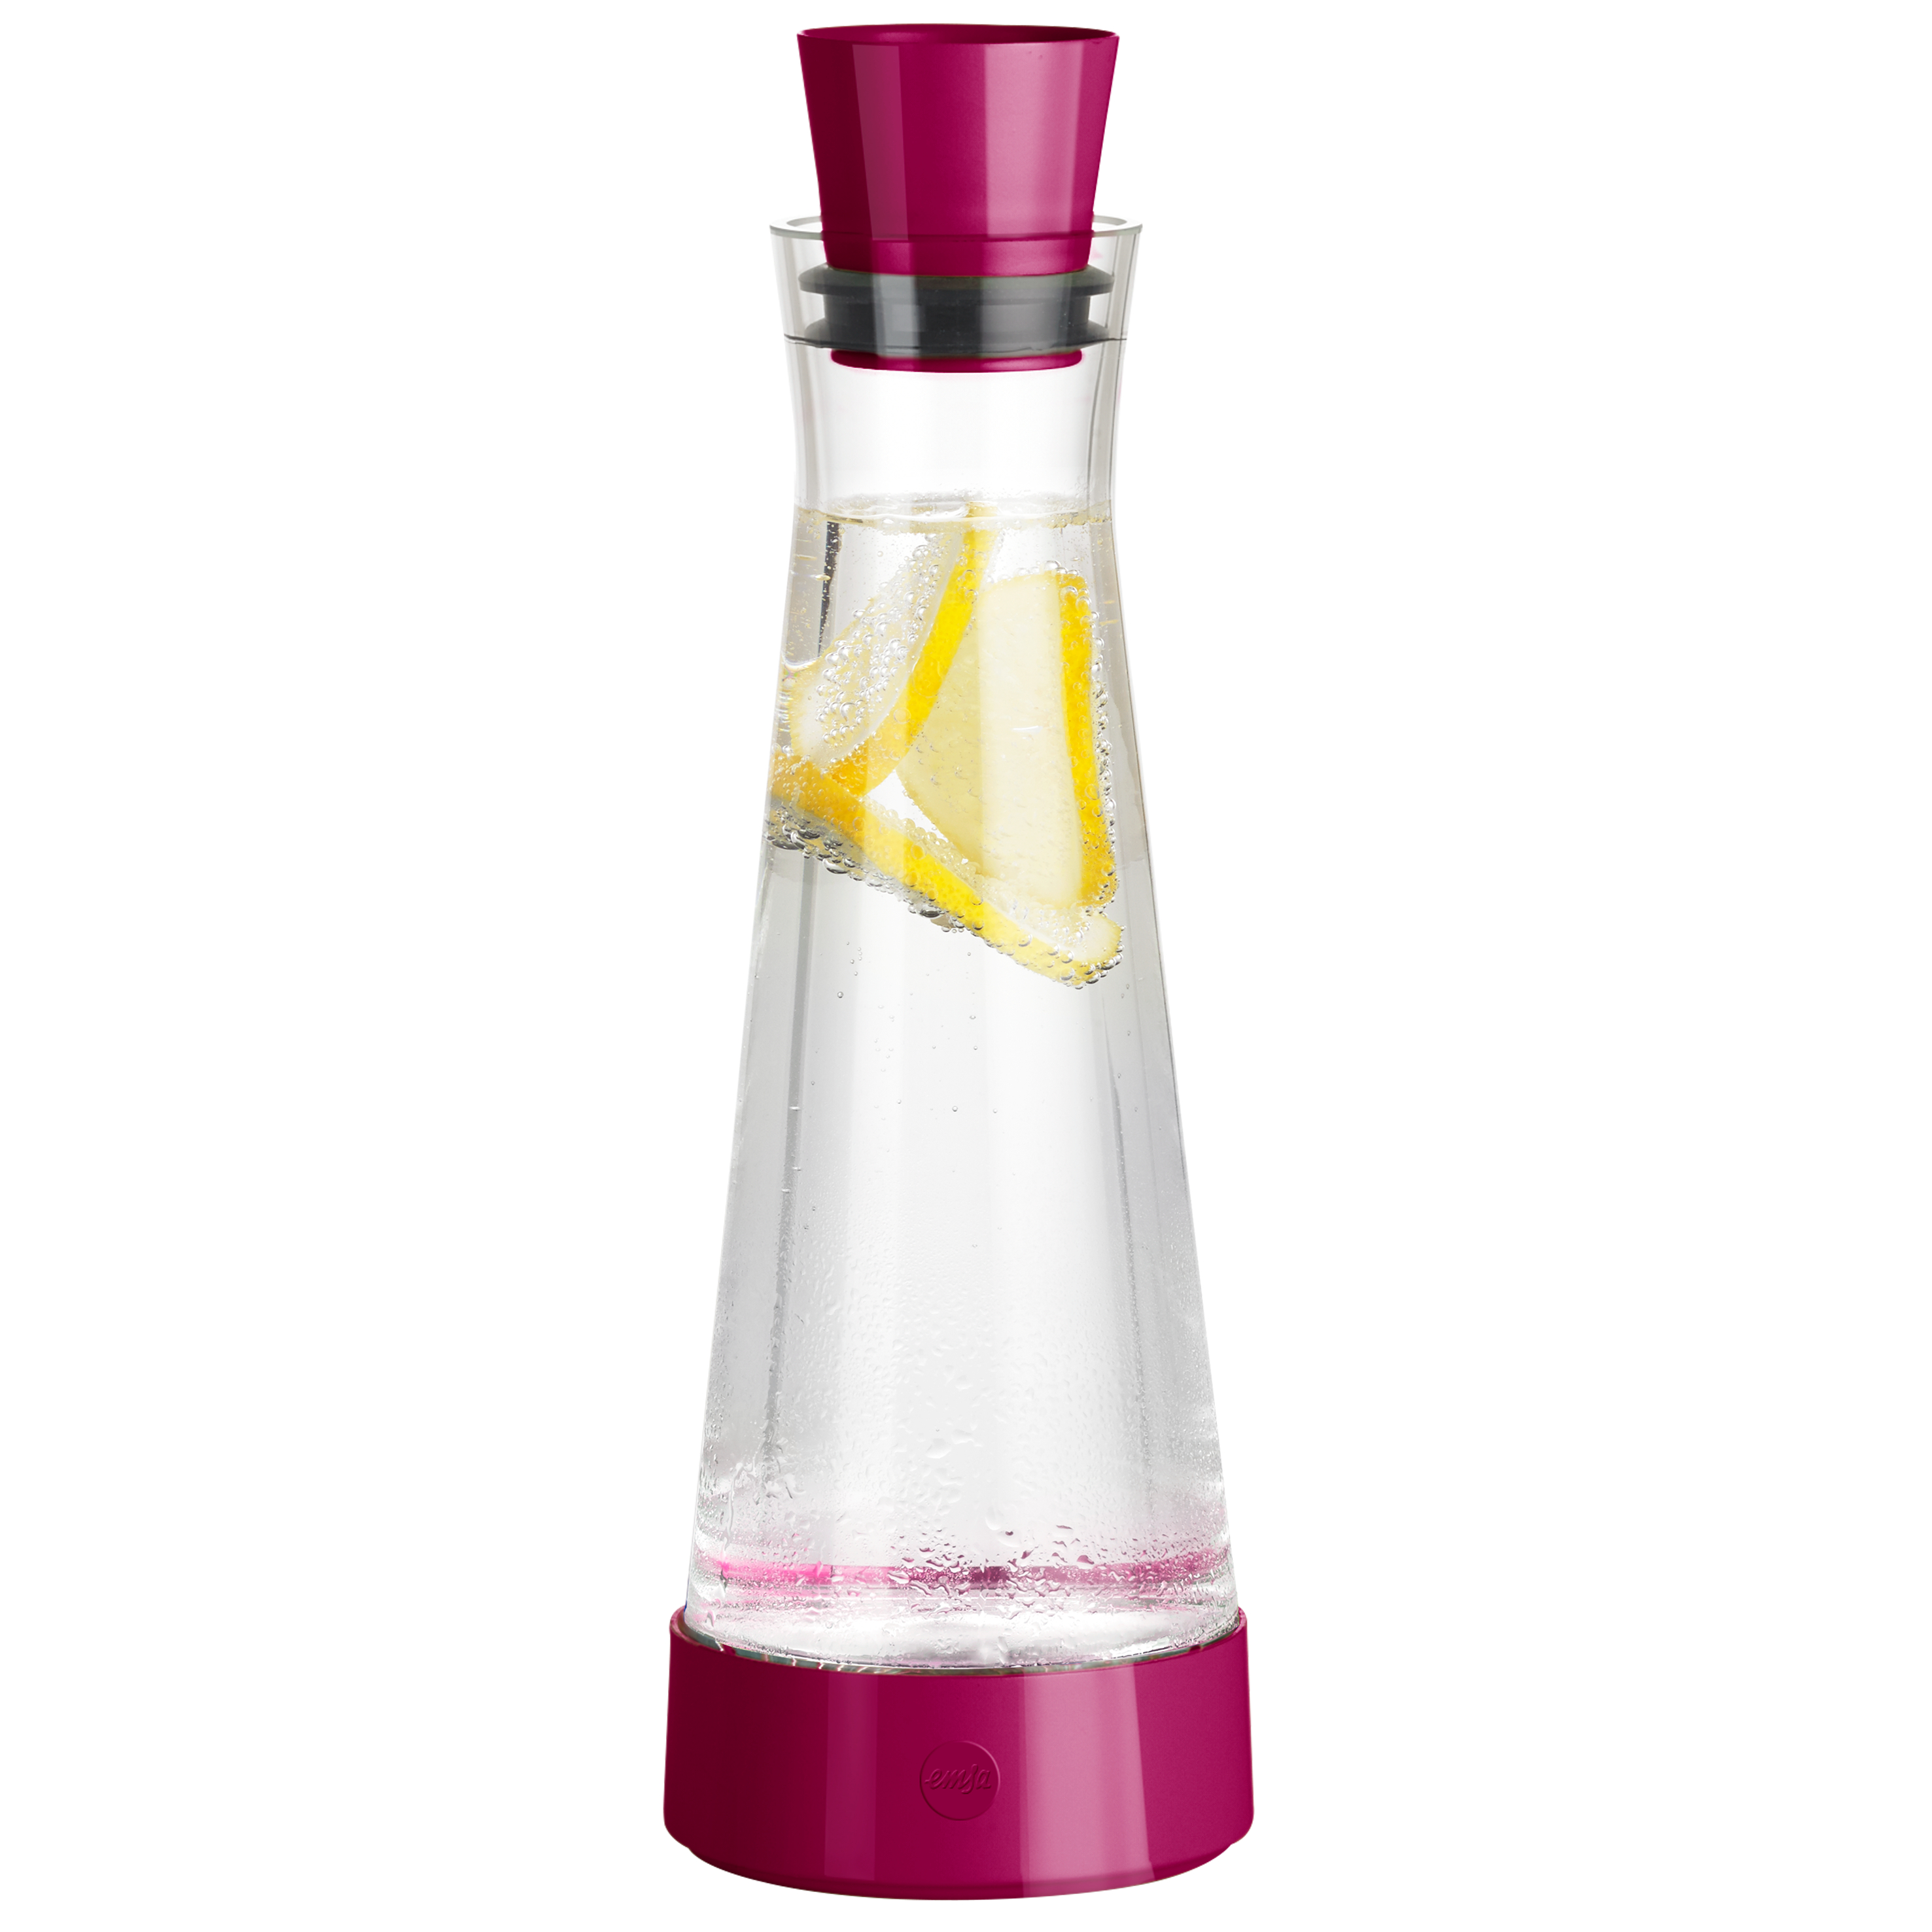 EMSA 515477 FLOW SLIM FRIENDS Glas-Kühlkaraffe 1,0 L Himbeer